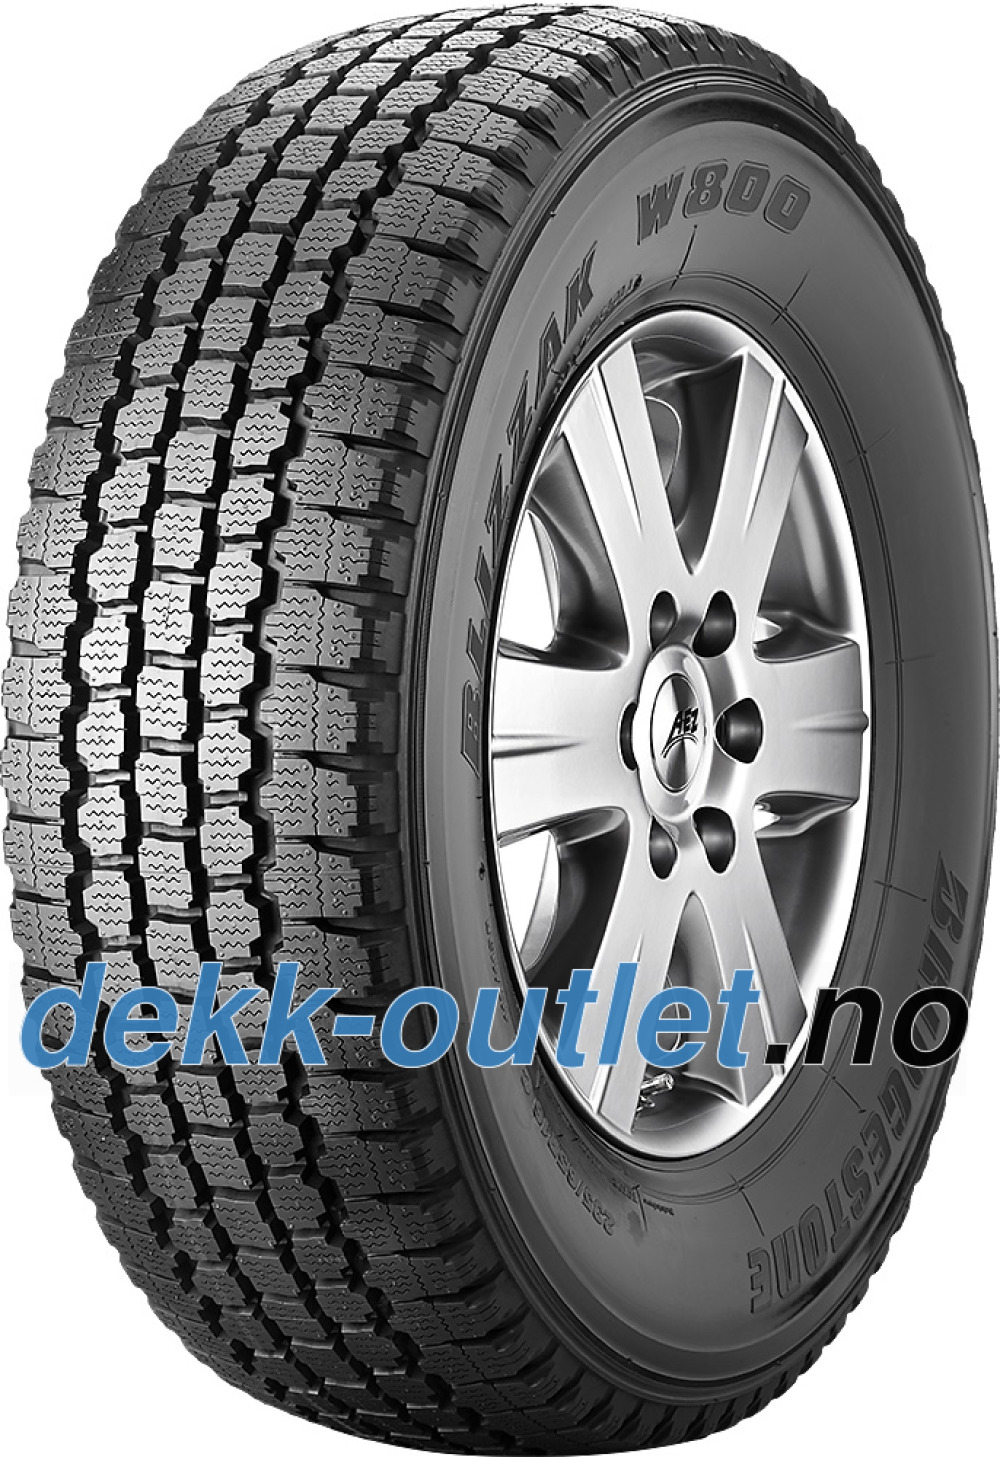 Bridgestone Blizzak W800 ( 195 R14C 106/104R 8PR )